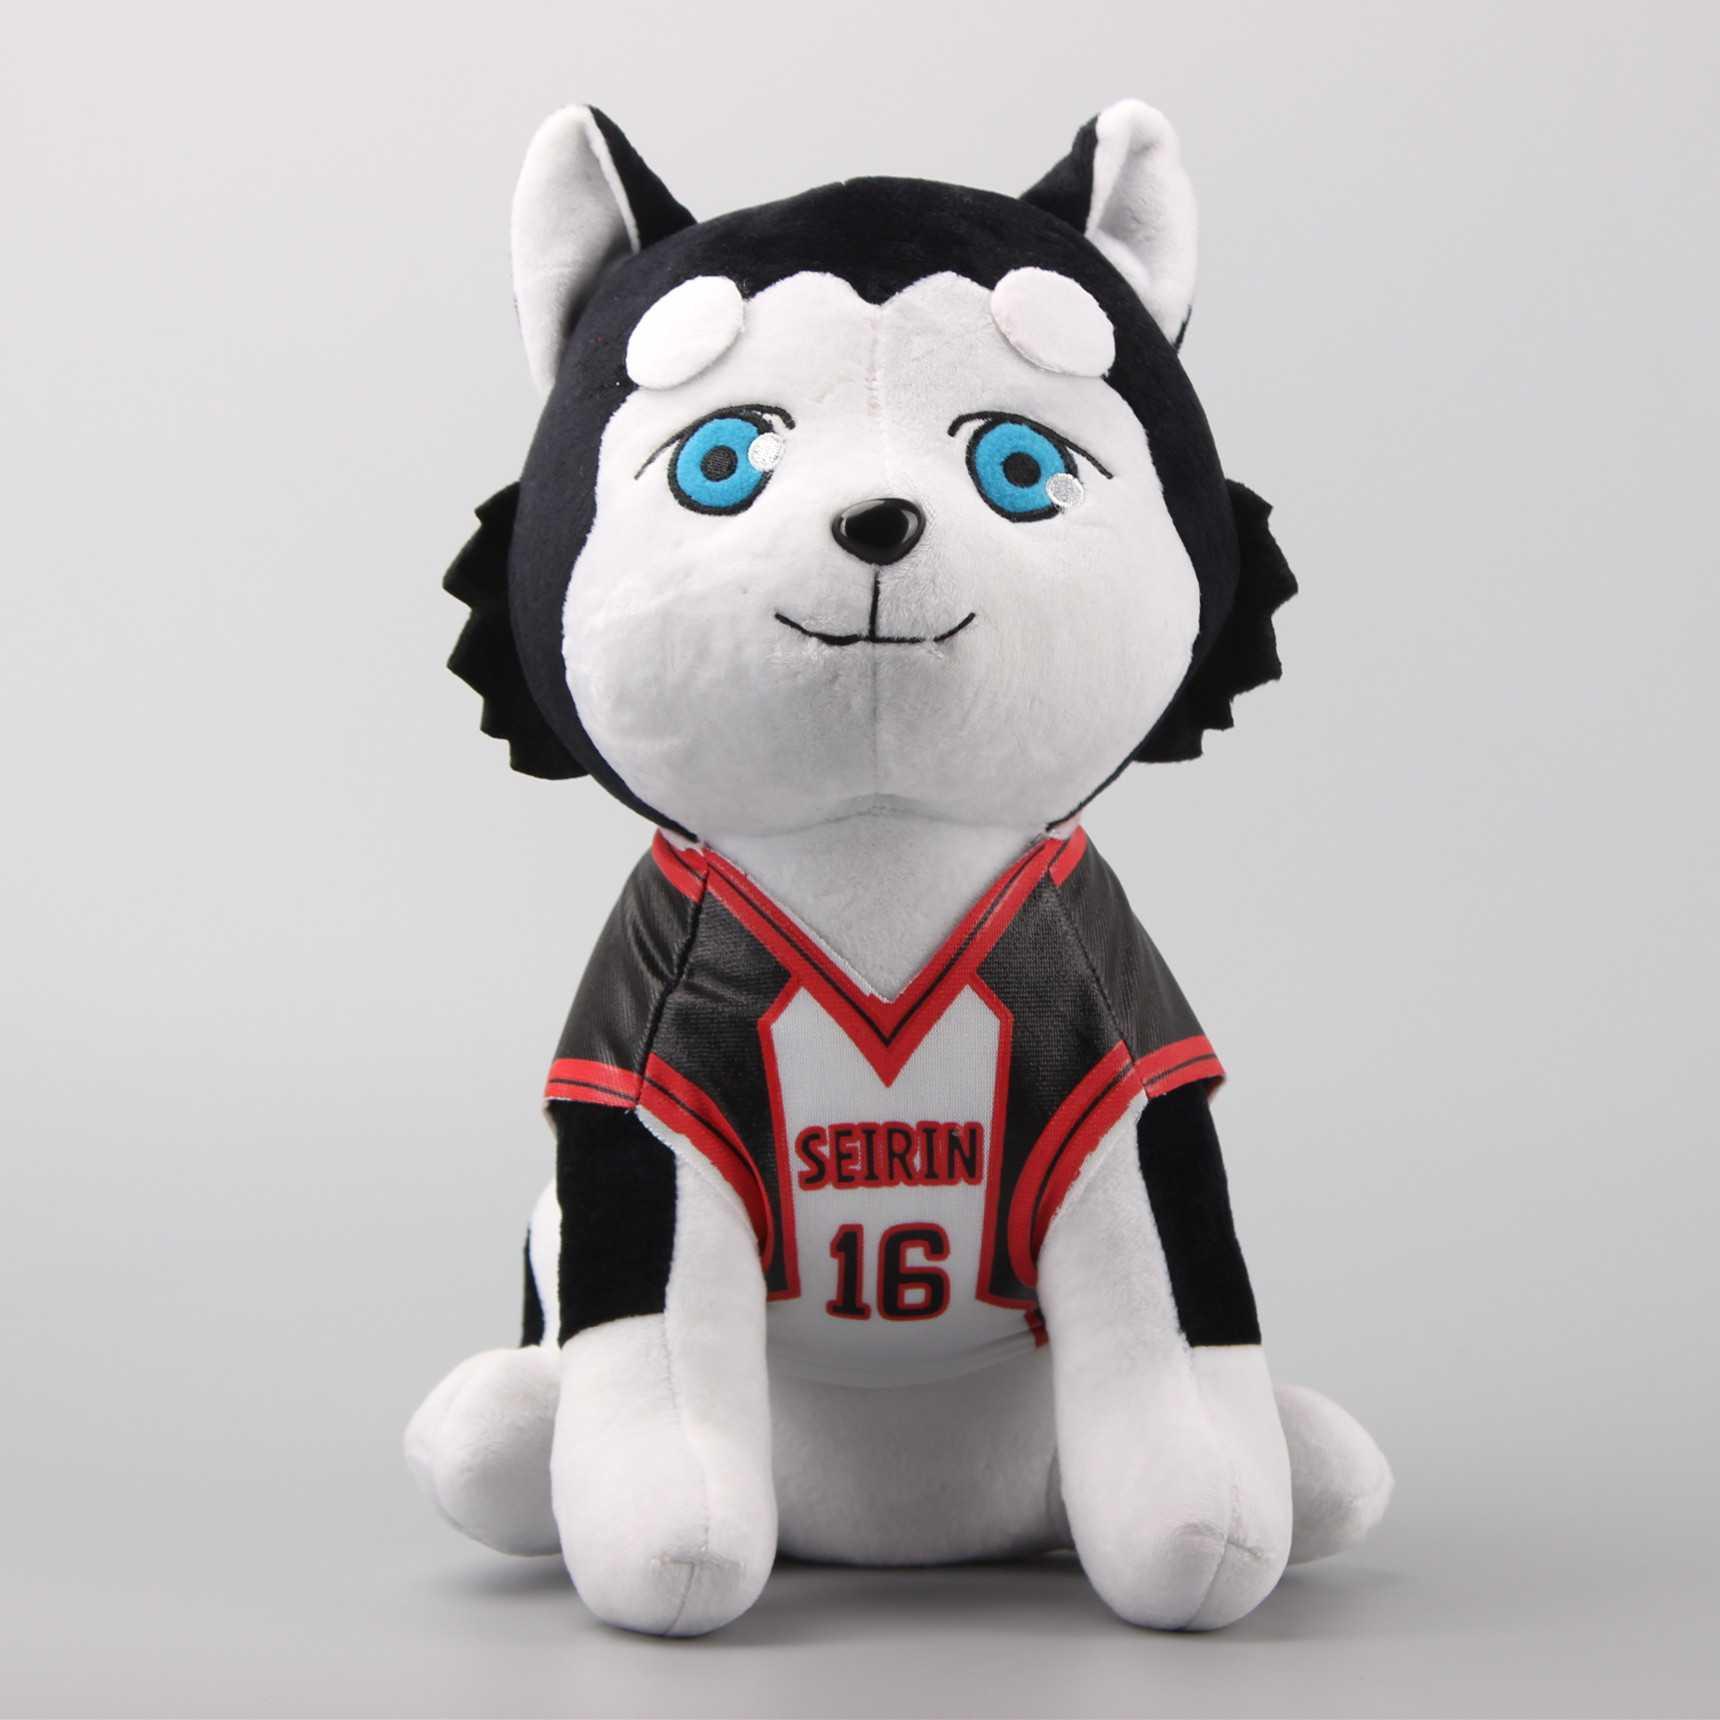 4 estilos anime kuroko no Basket kuroko Tetsuya 11 y seirin perro 16 peluche  Muñecas felpa Juguetes 12 30 cm 22f0f585309f